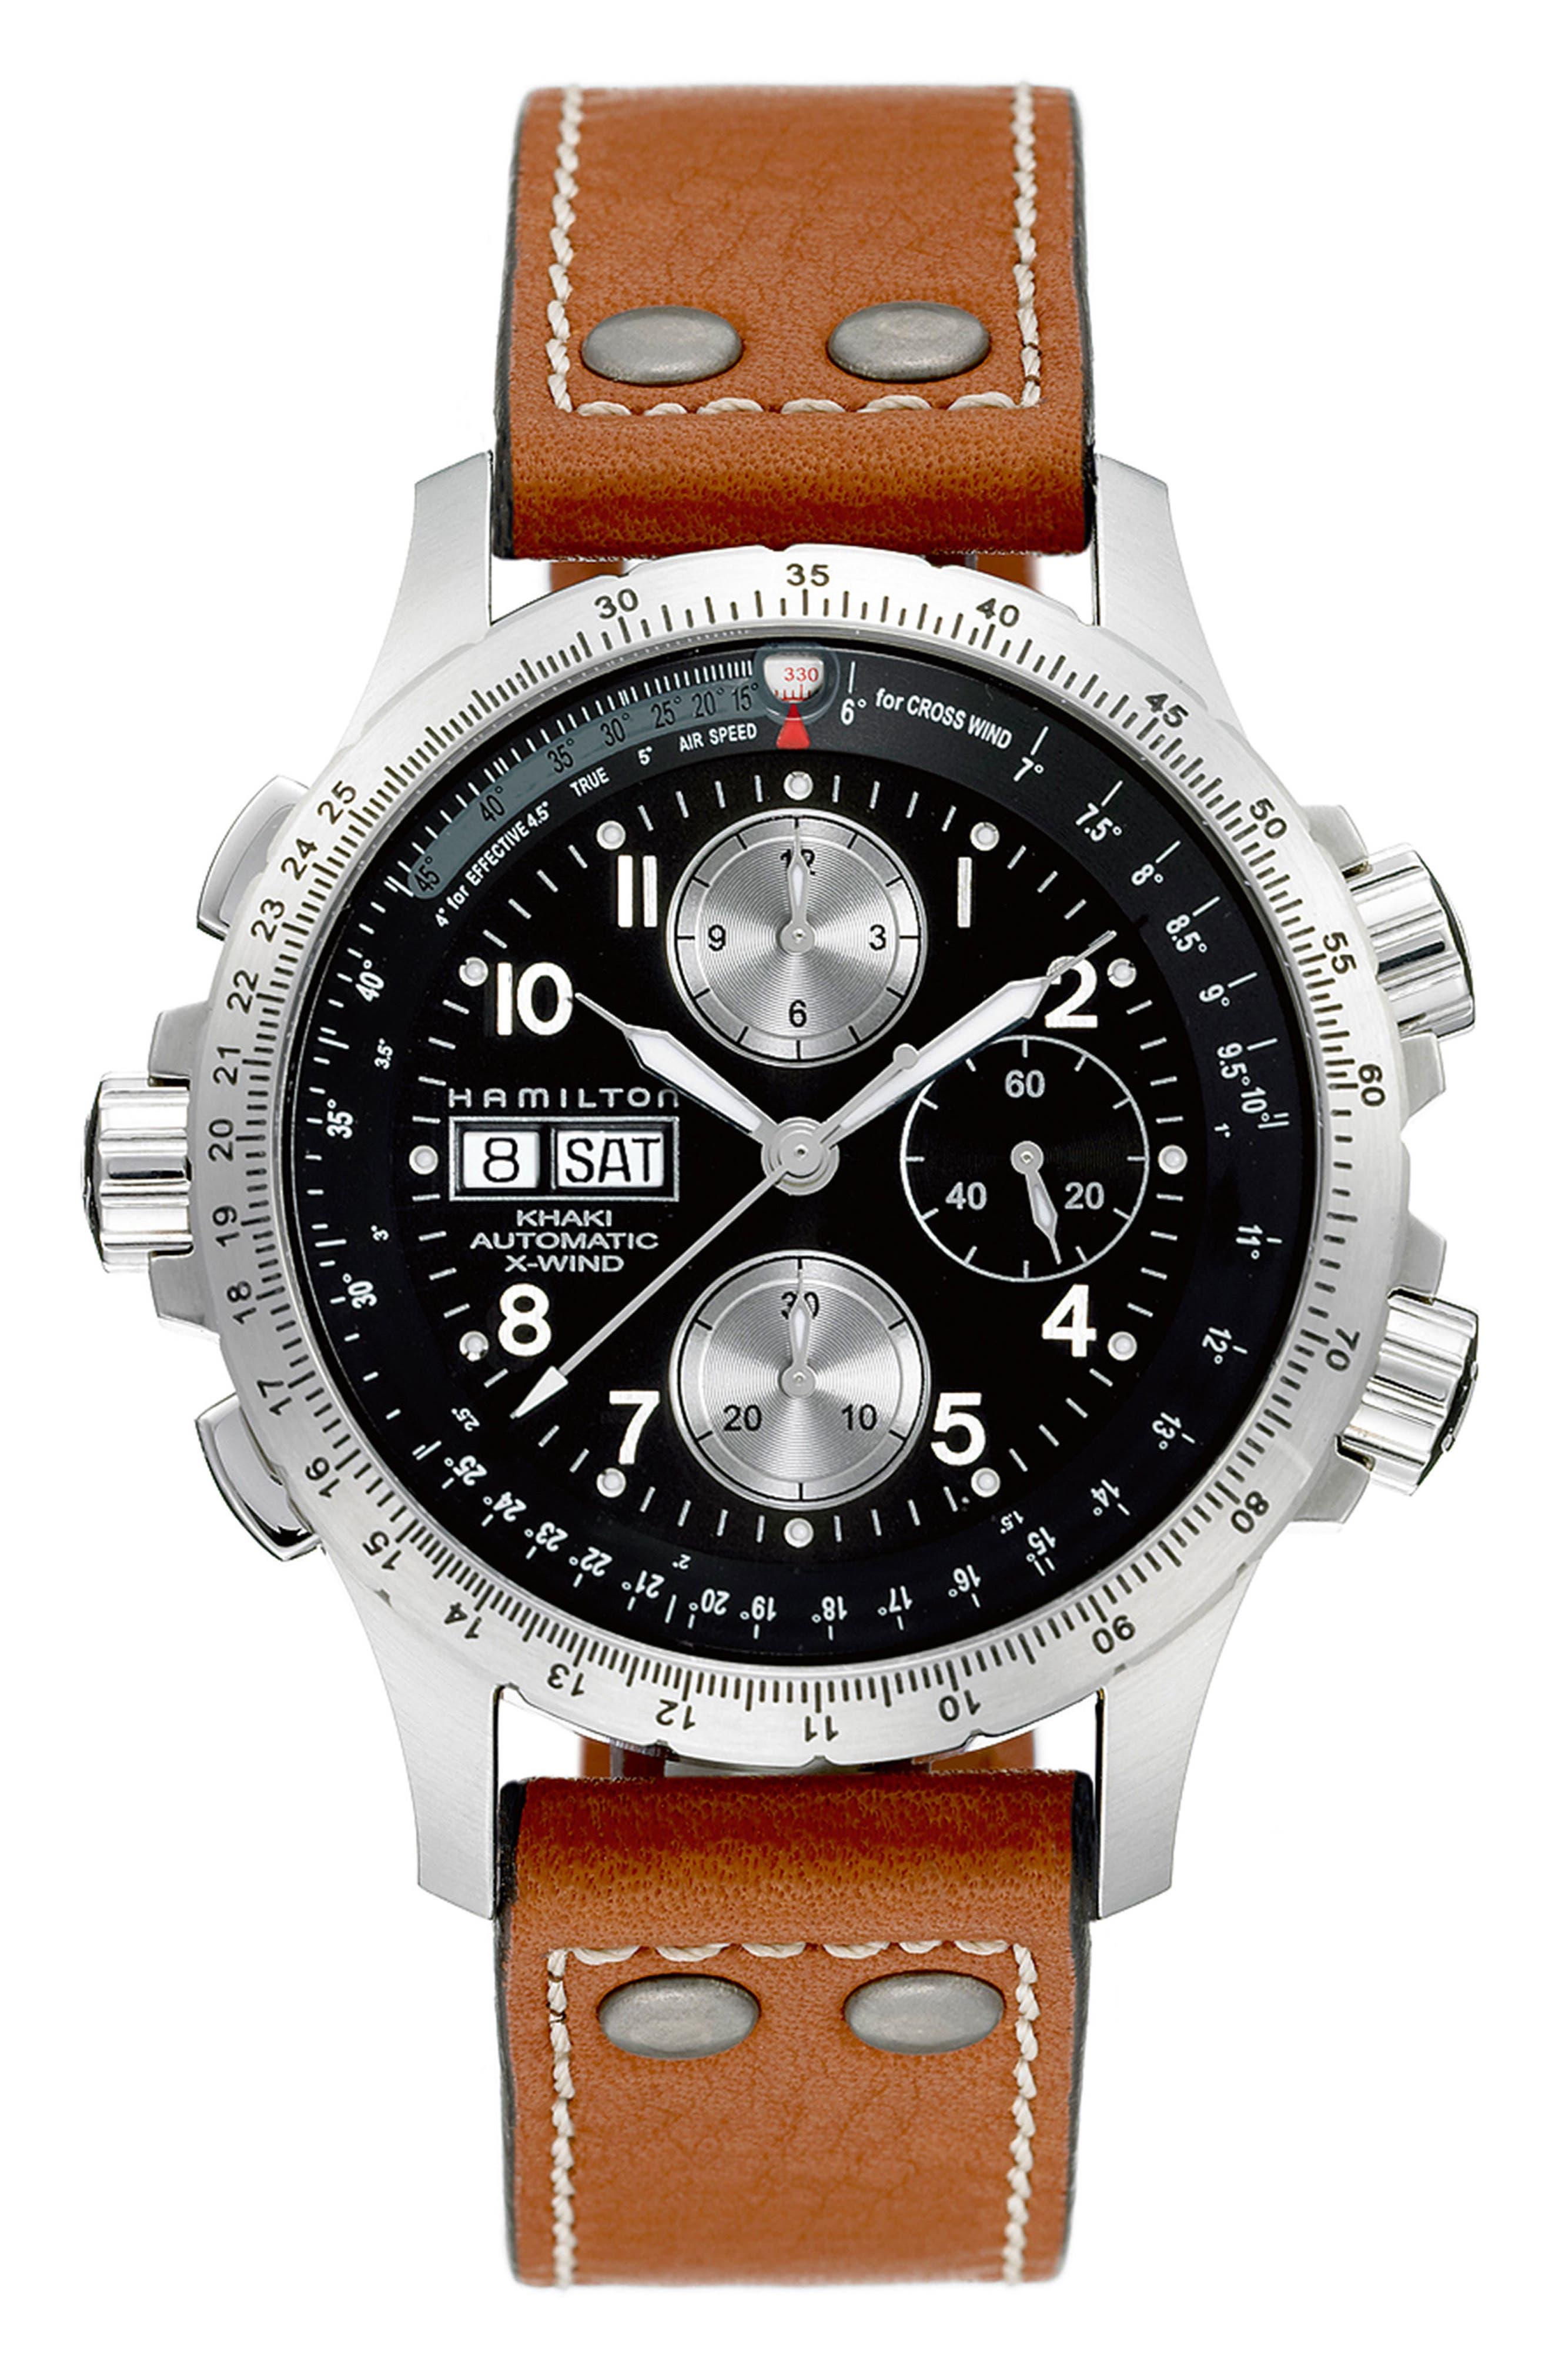 Main Image - Hamilton Khaki Aviation X-Wind Automatic Chronograph Leather Strap Watch, 44mm